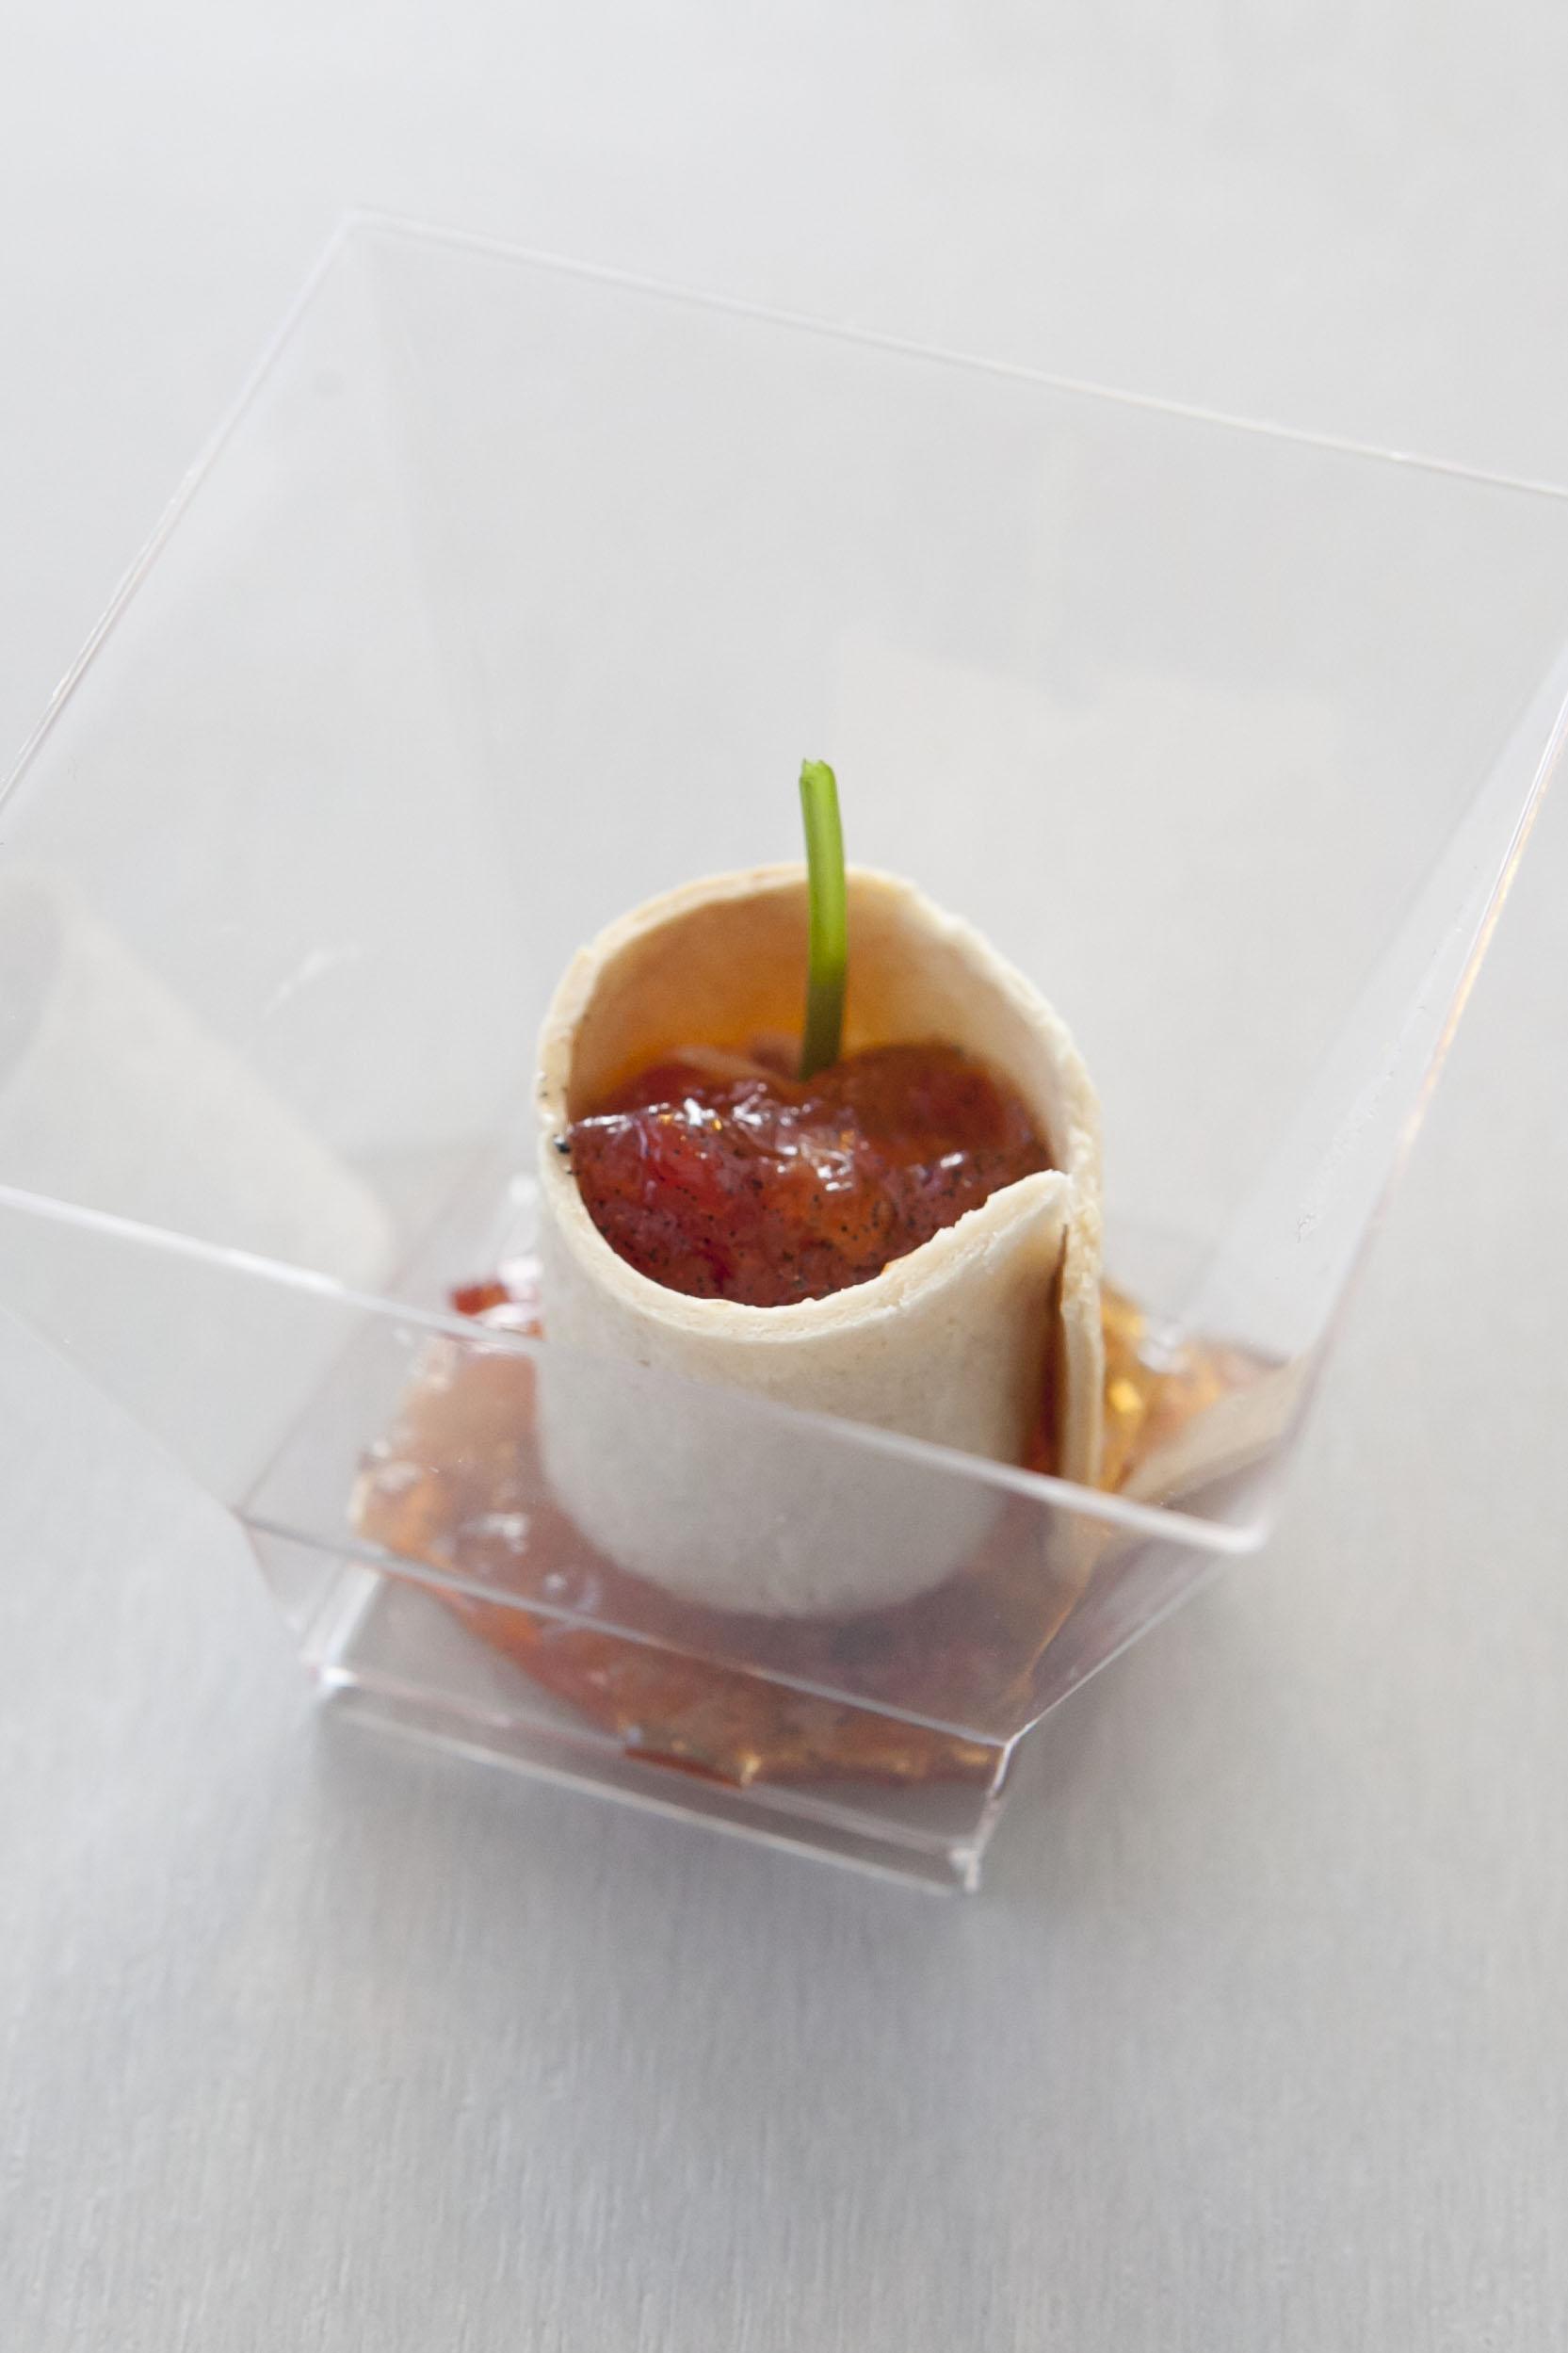 _MG_8823 Canutillos de longaniza con Confitura de Tomate a la Vainilla